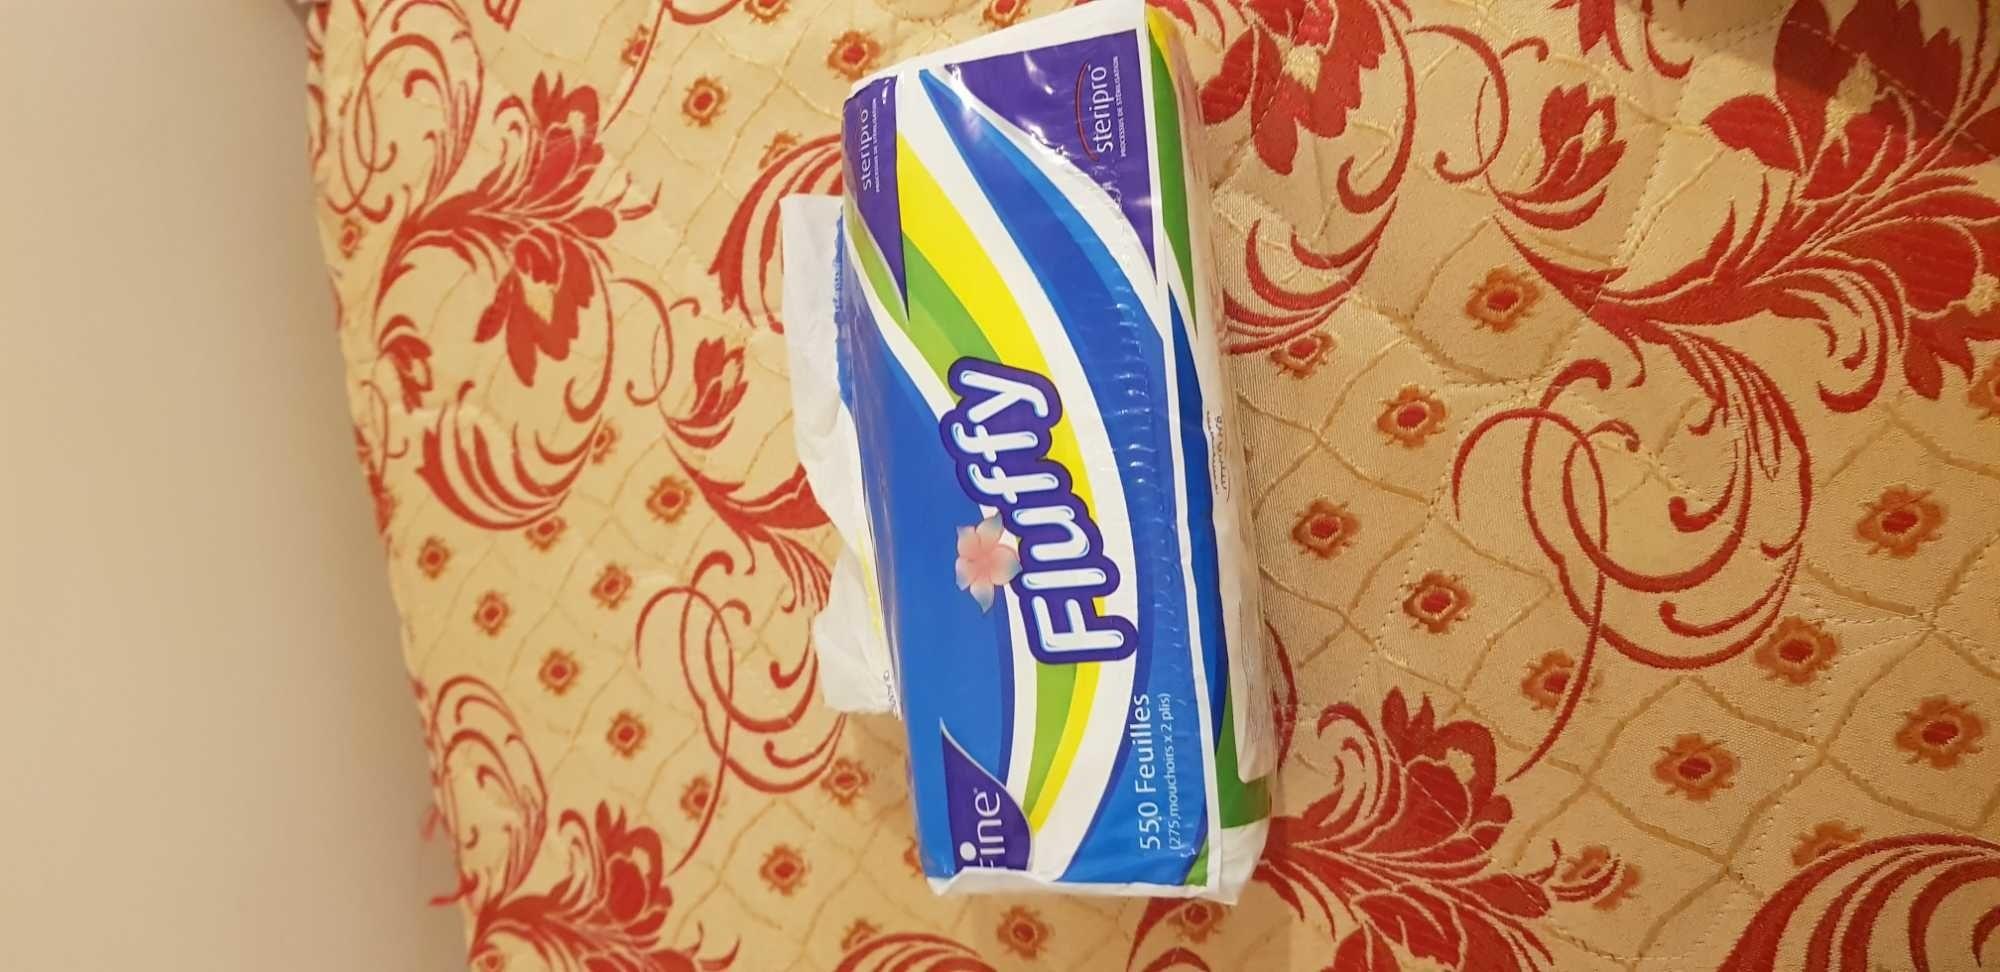 Flufffy - Product